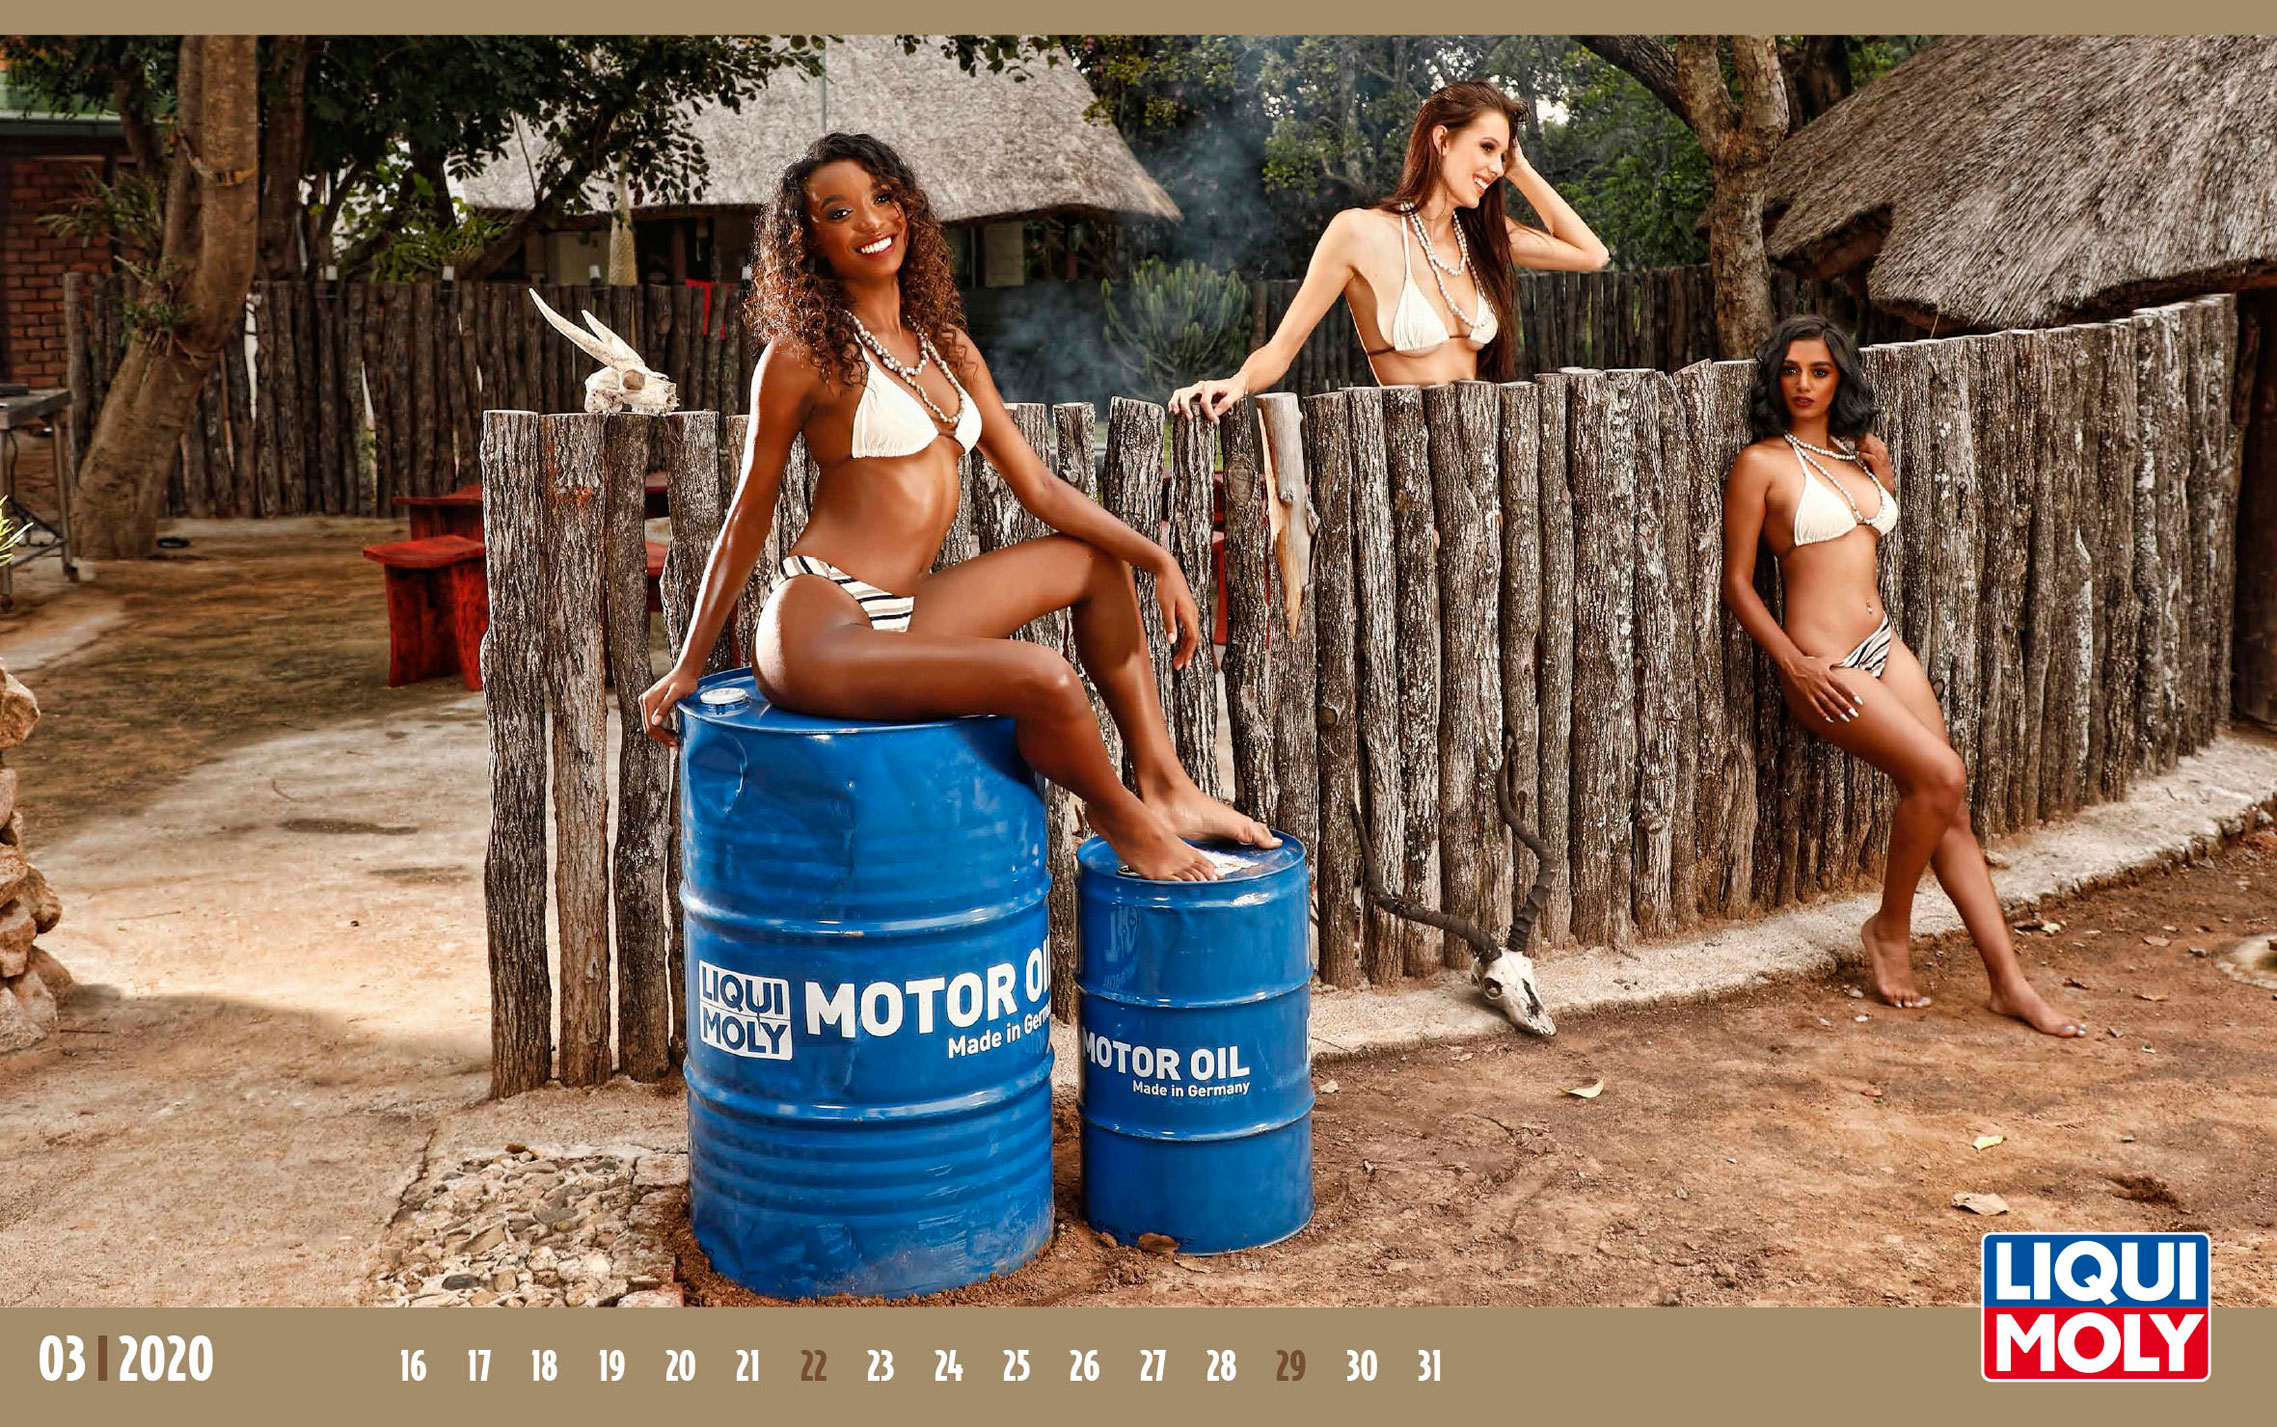 Календарь с девушками автоконцерна Liqui Moly, 2020 год / март-2